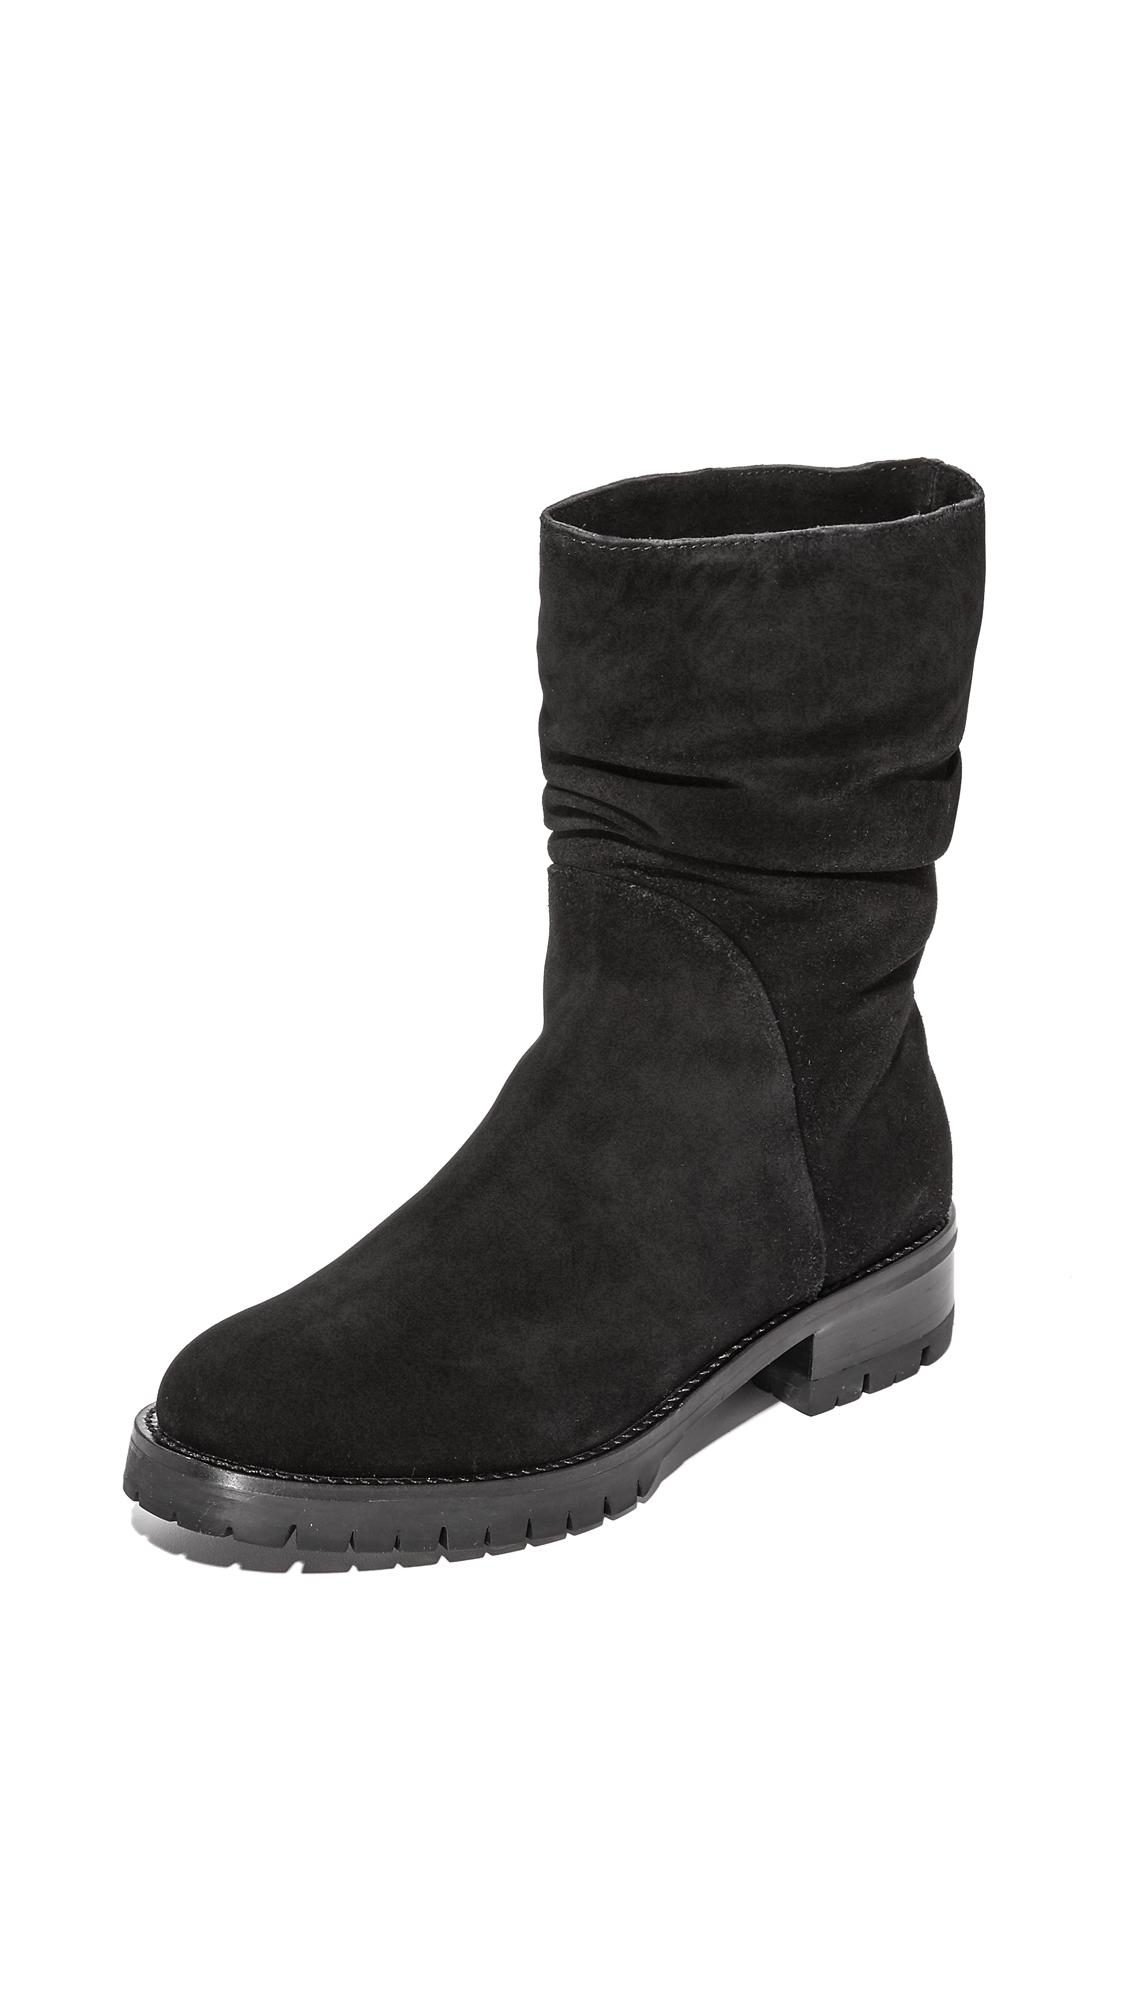 Dkny Marley Shearling Riding Boots - Black